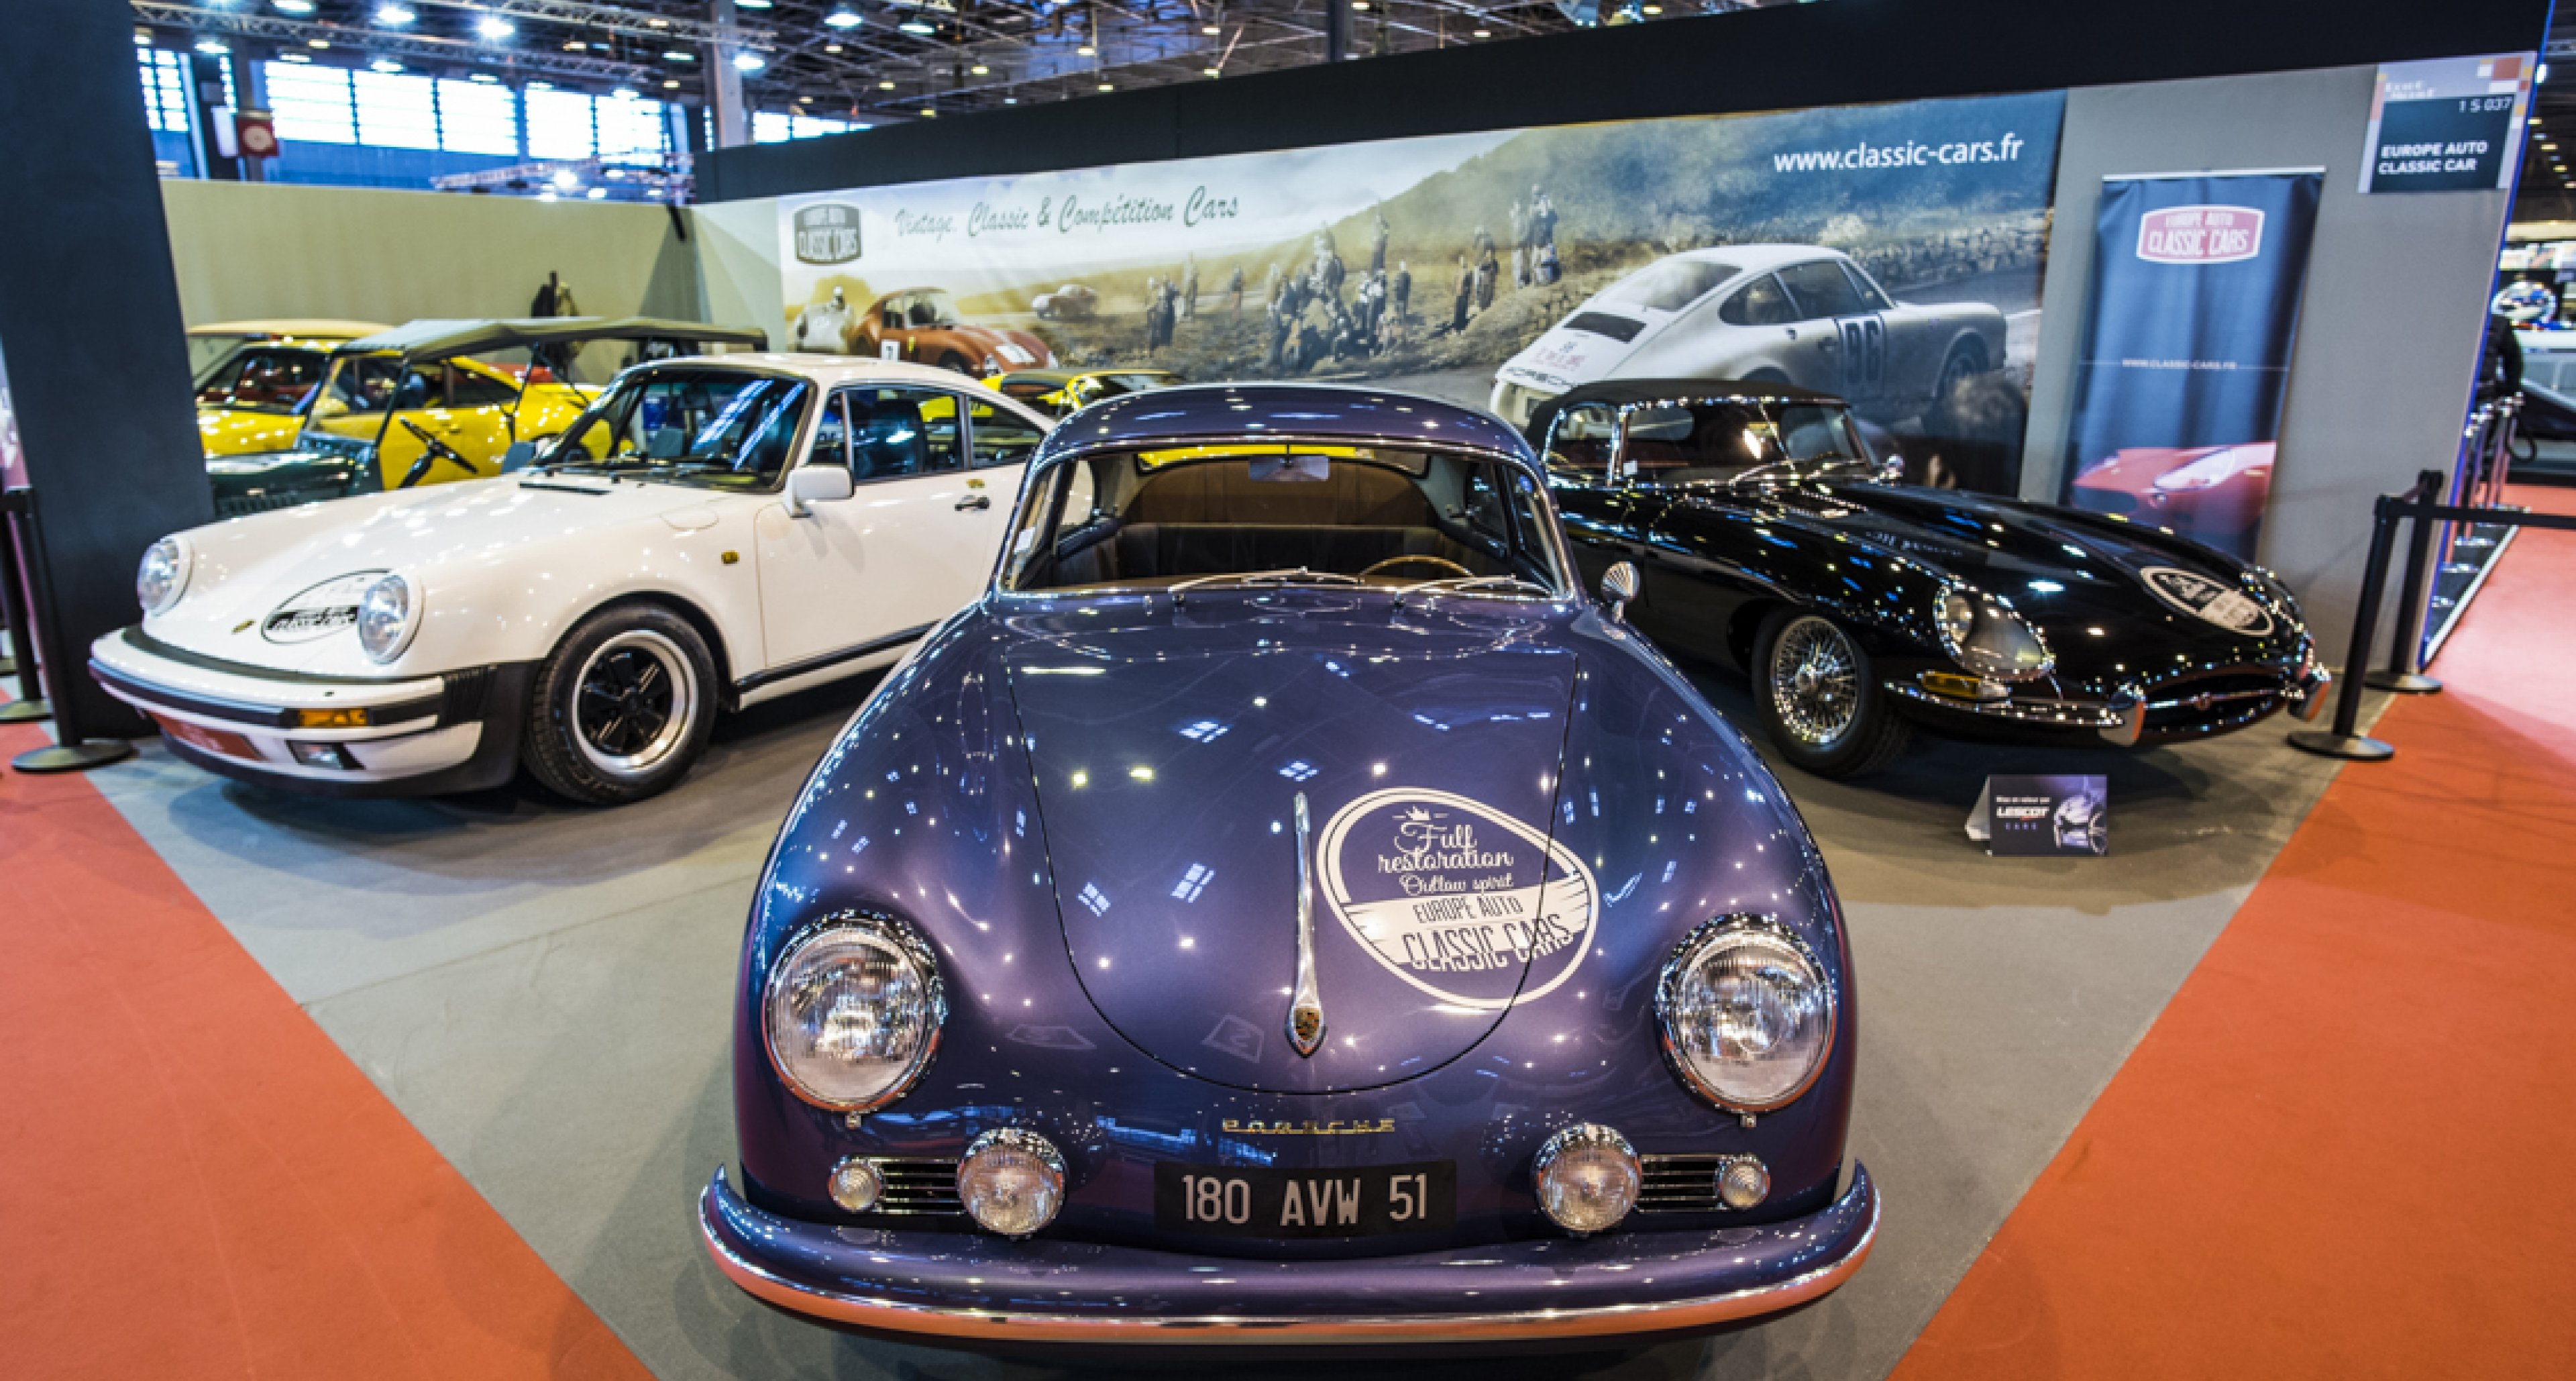 Europe Auto Classic Cars